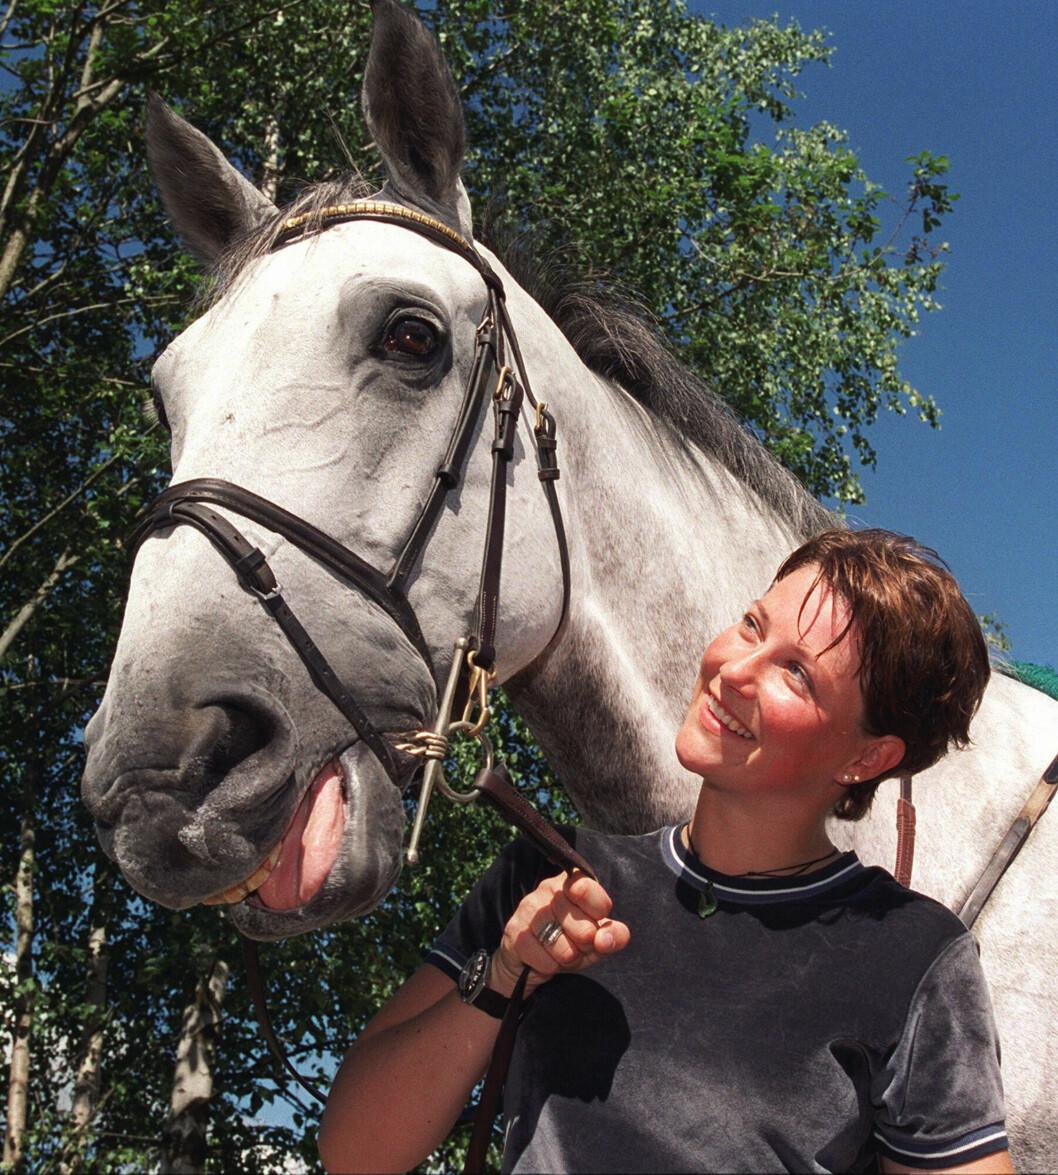 NÆRT FORHOLD: Prinsesse Märtha Louise md hesten Lenaro i 1999. Foto: NTB scanpix